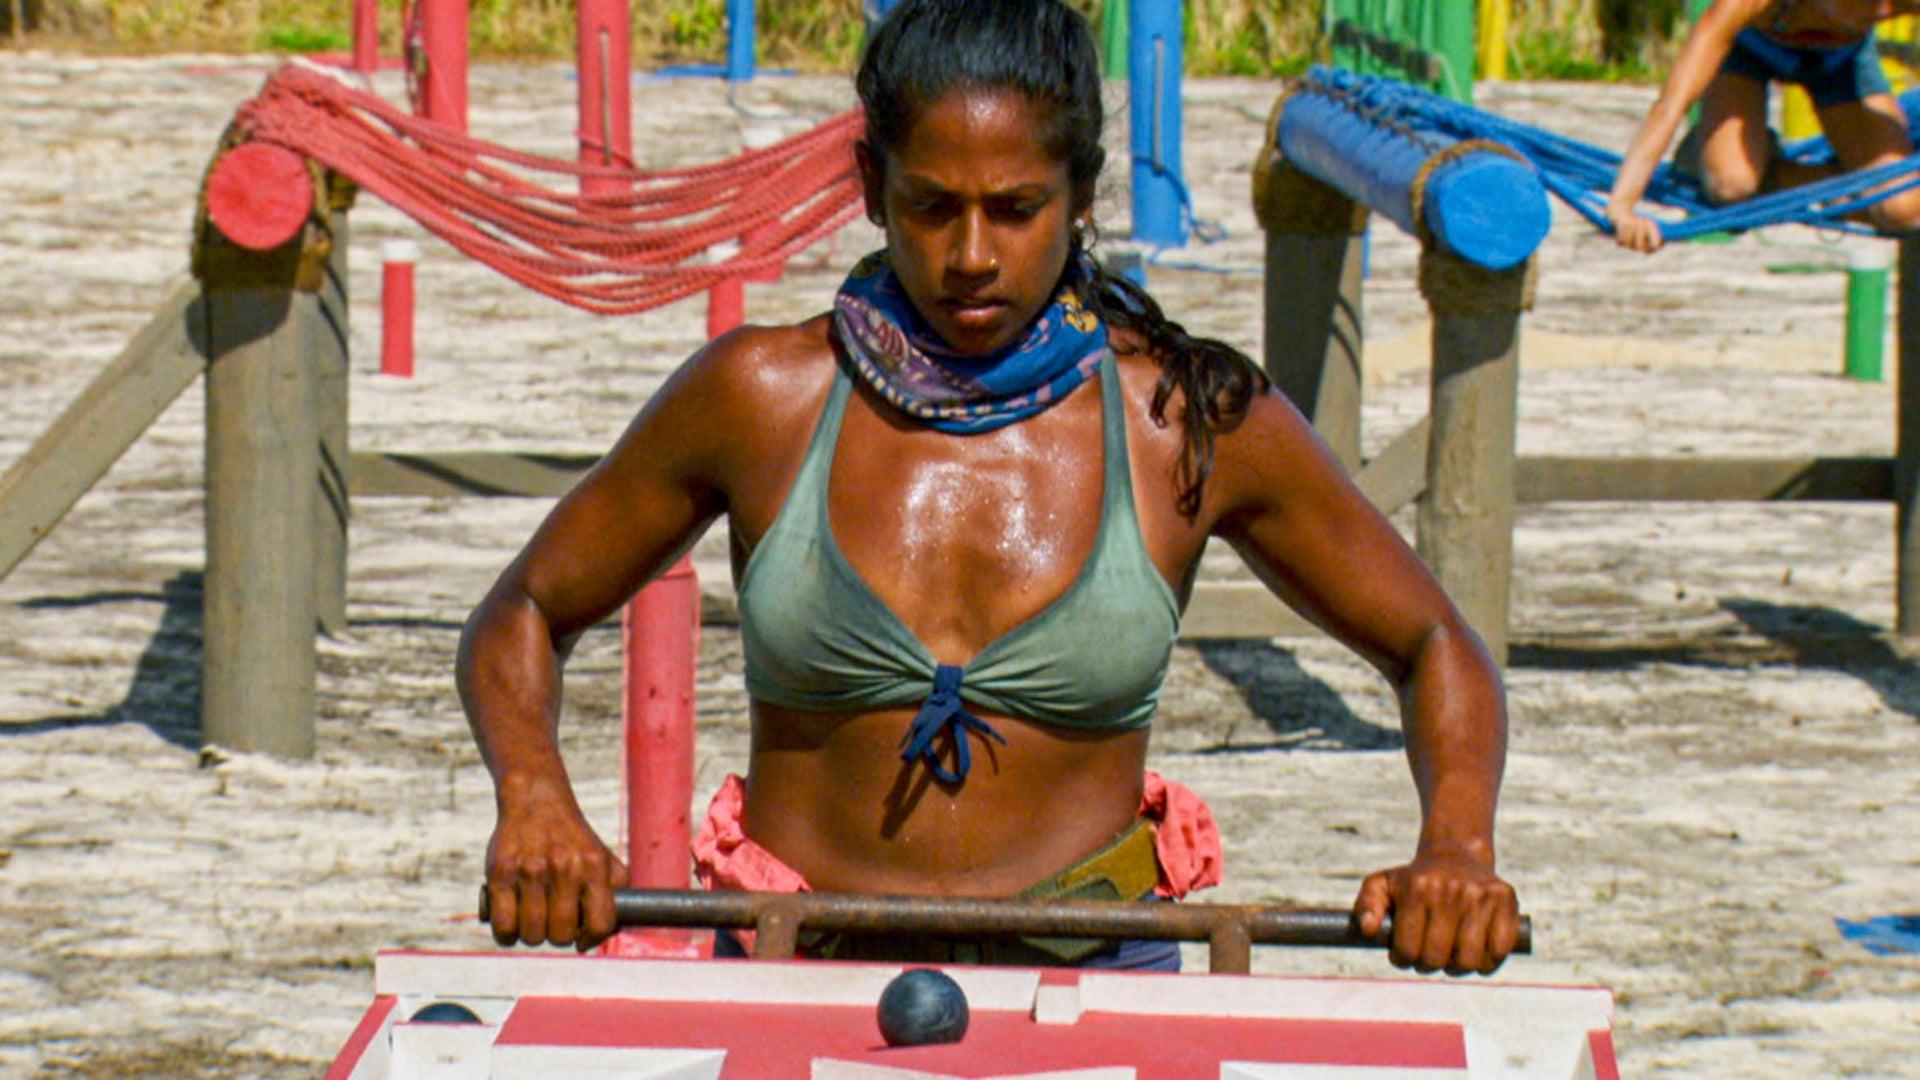 Natalie Anderson competes in the Survivor: Winners at War return challenge